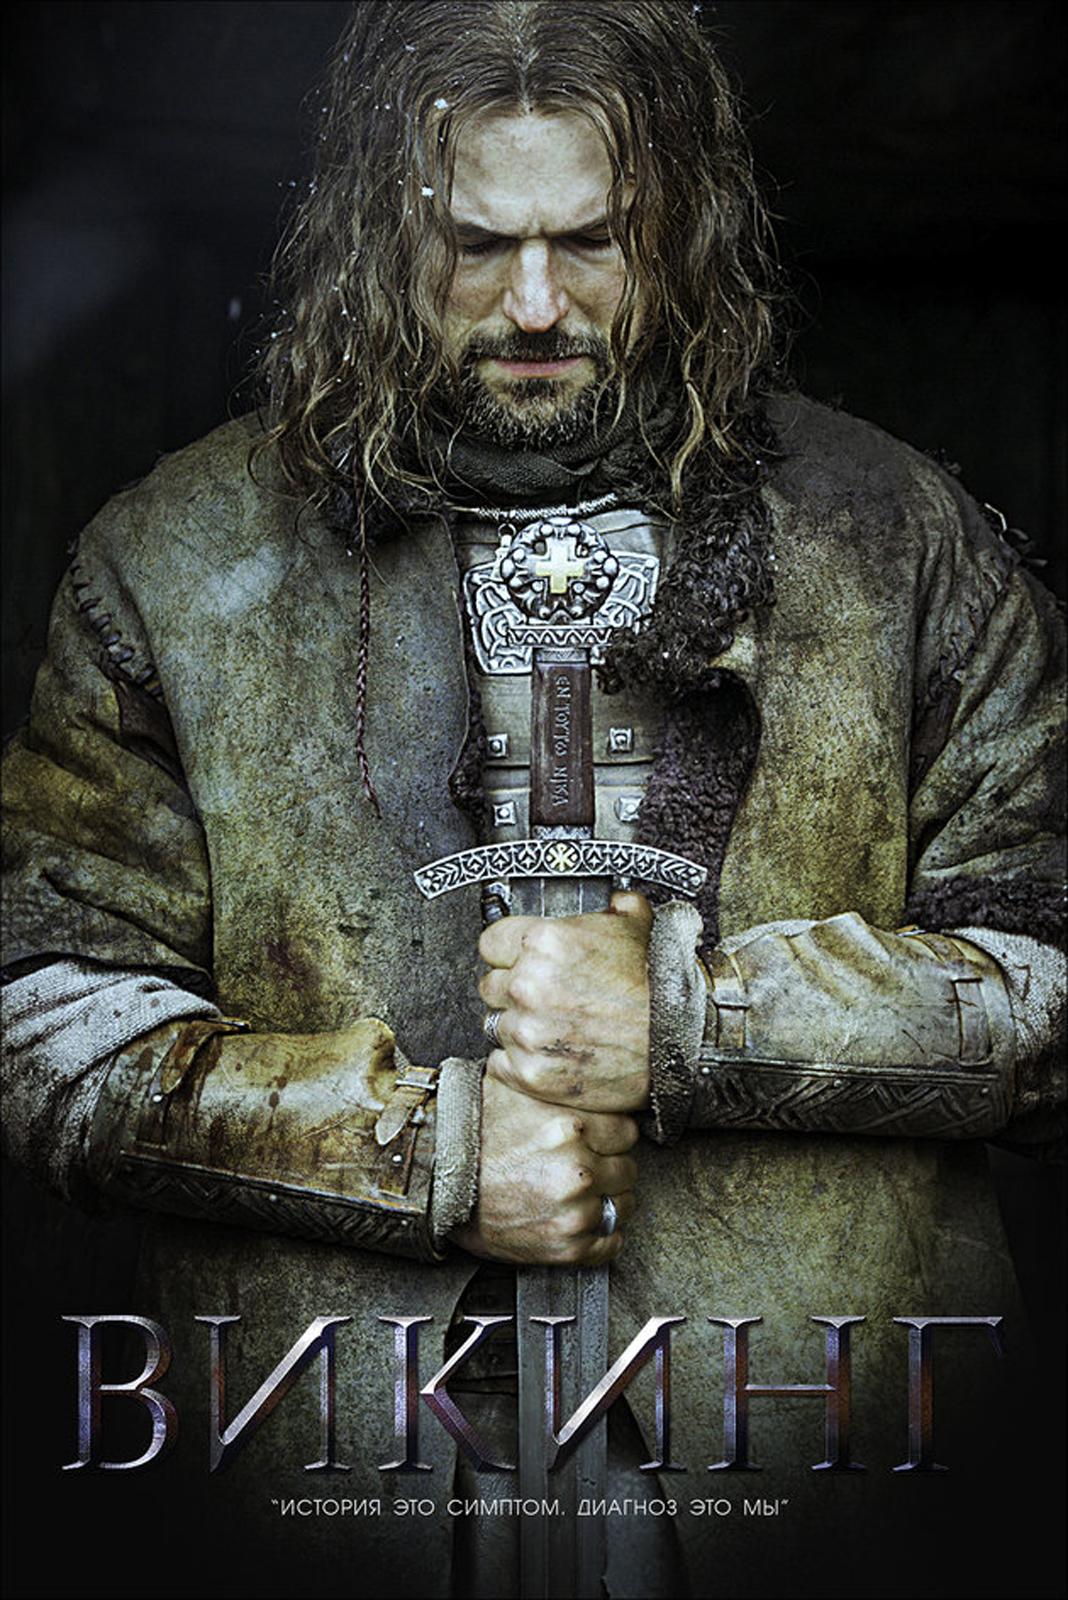 peliculas vikingos